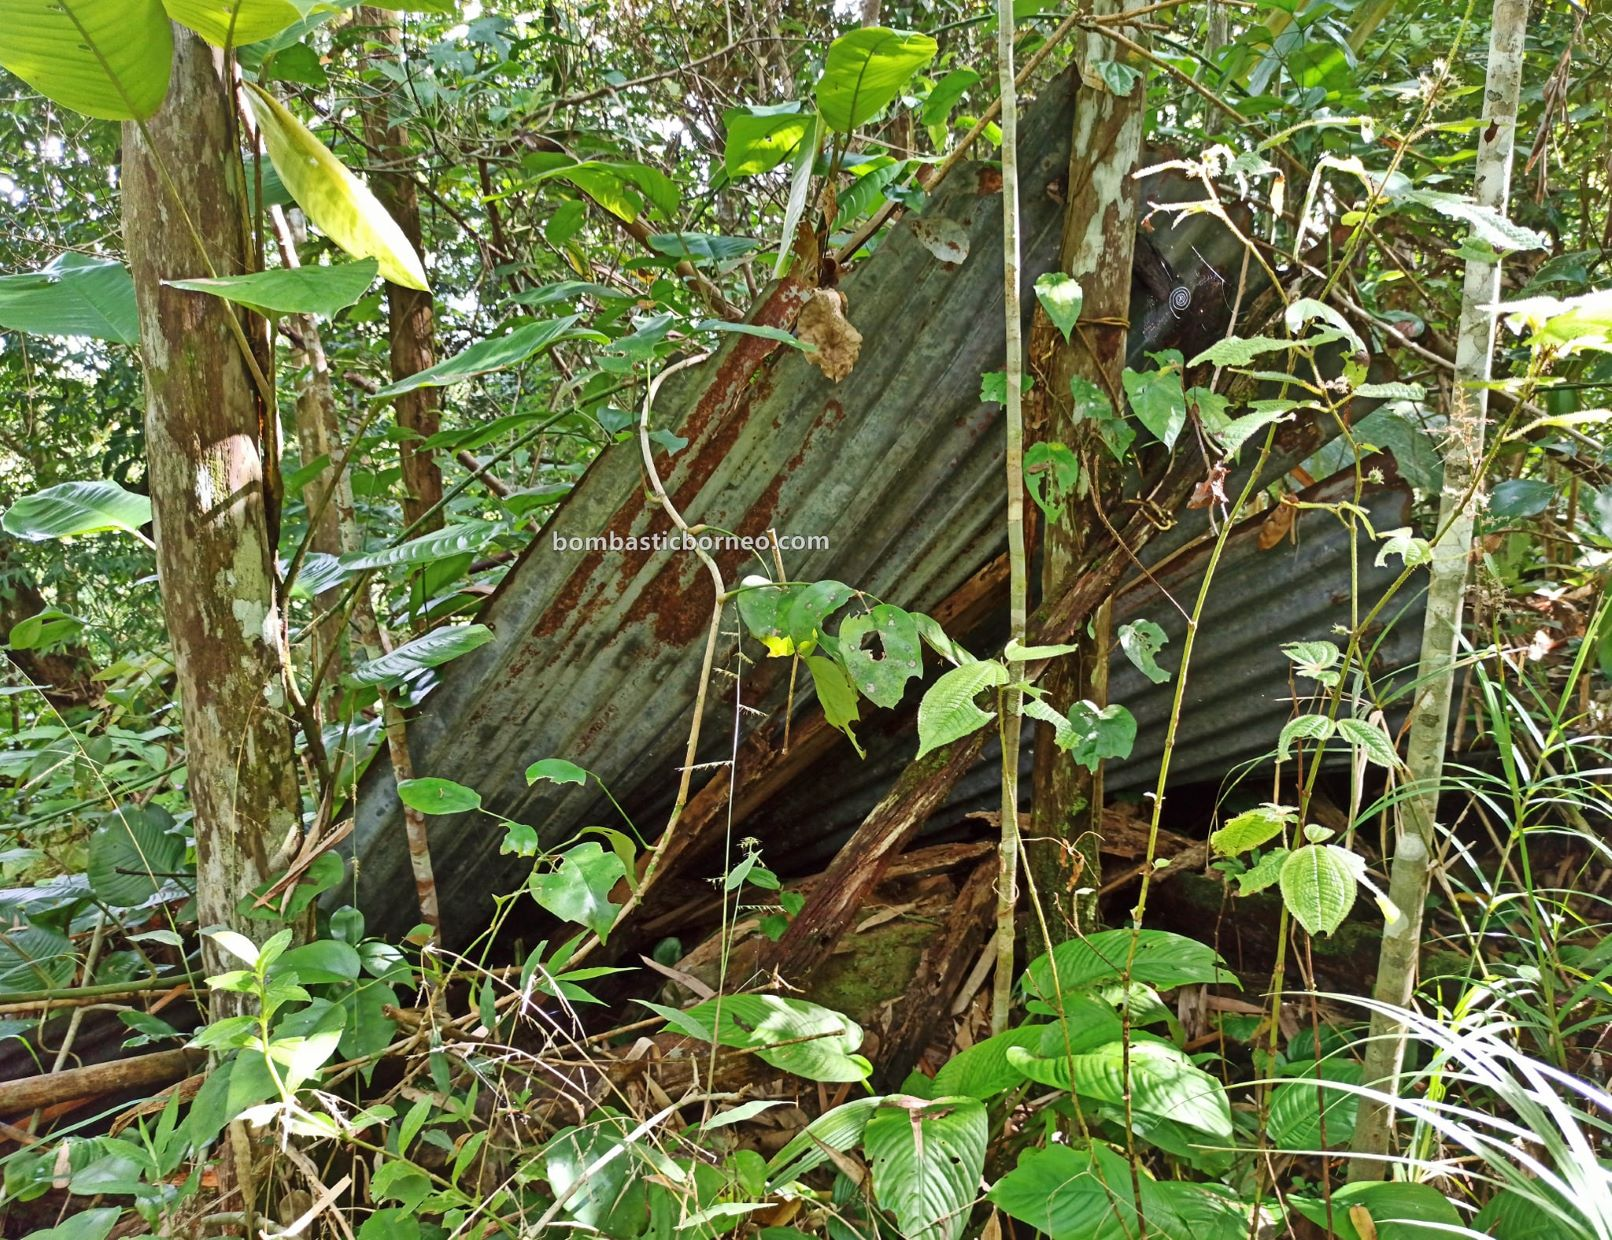 rainforest, outdoor, jungle trekking, hiking, Kuching, Sarawak, Malaysia, Tourism, travel guide, limestone ravine, Borneo, 穿越婆罗洲游踪, 马来西亚砂拉越, 古晋丛林徒步